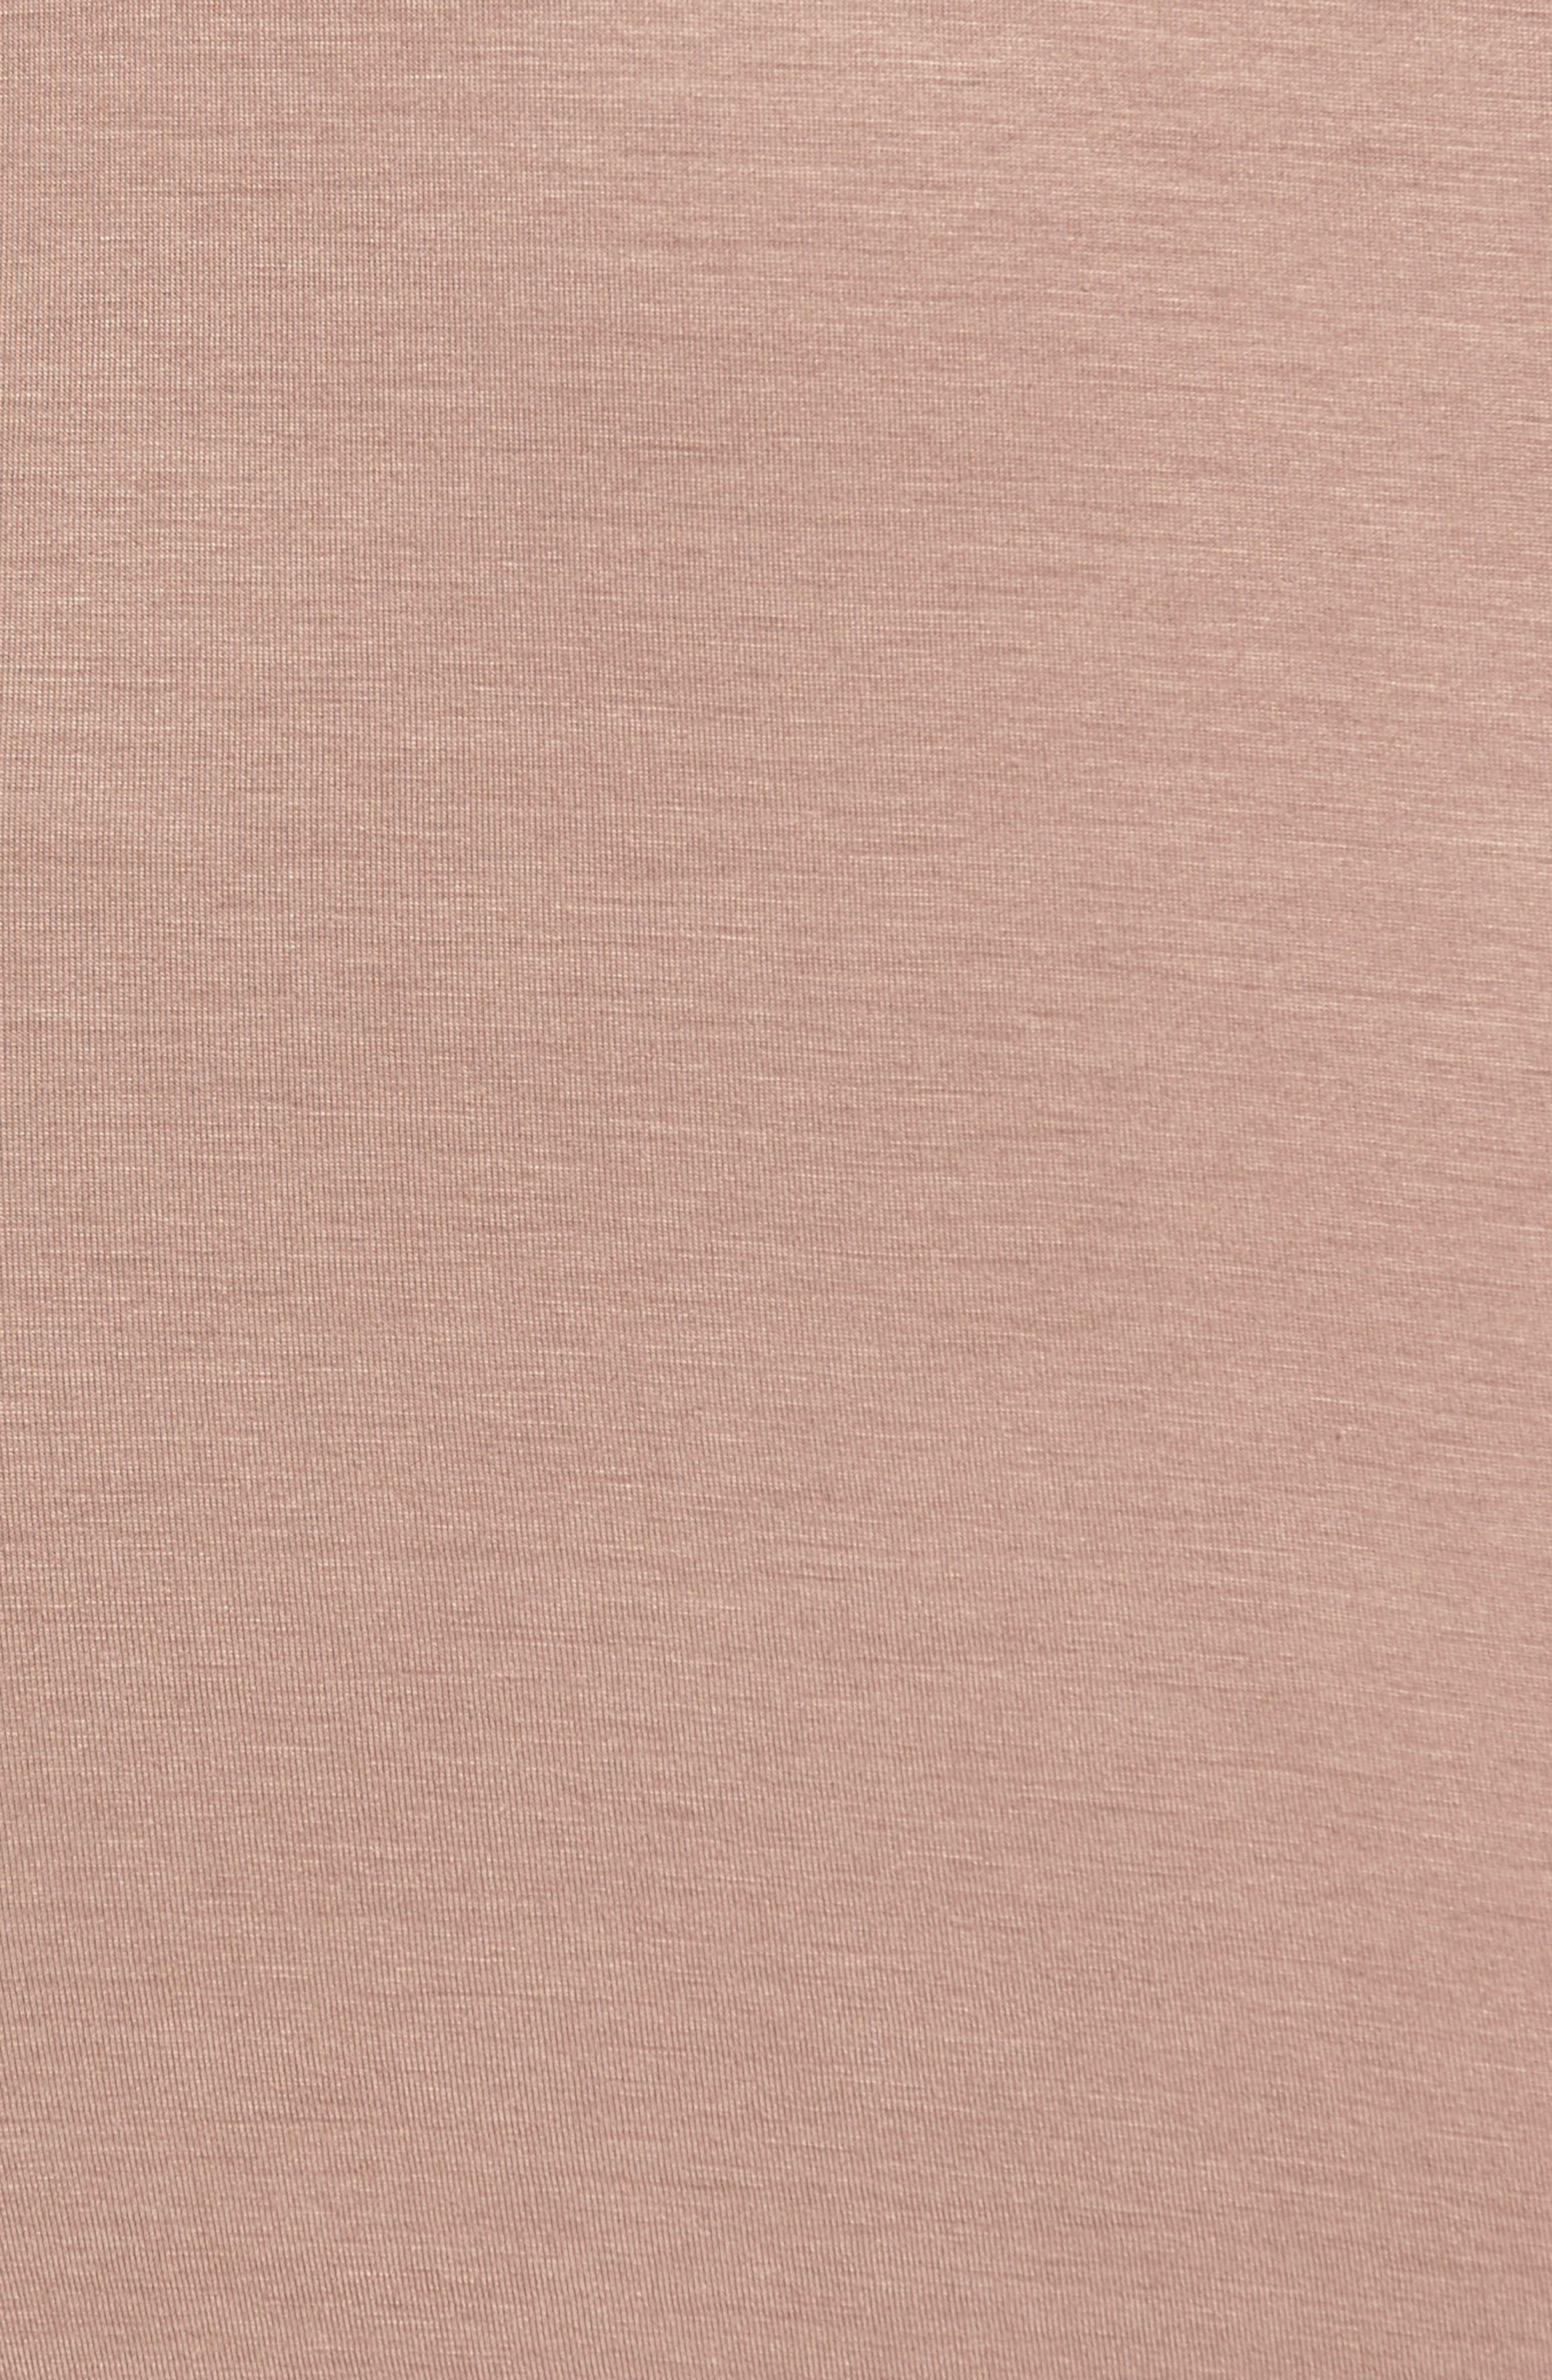 Cowl Neck Shift Dress,                             Alternate thumbnail 72, color,